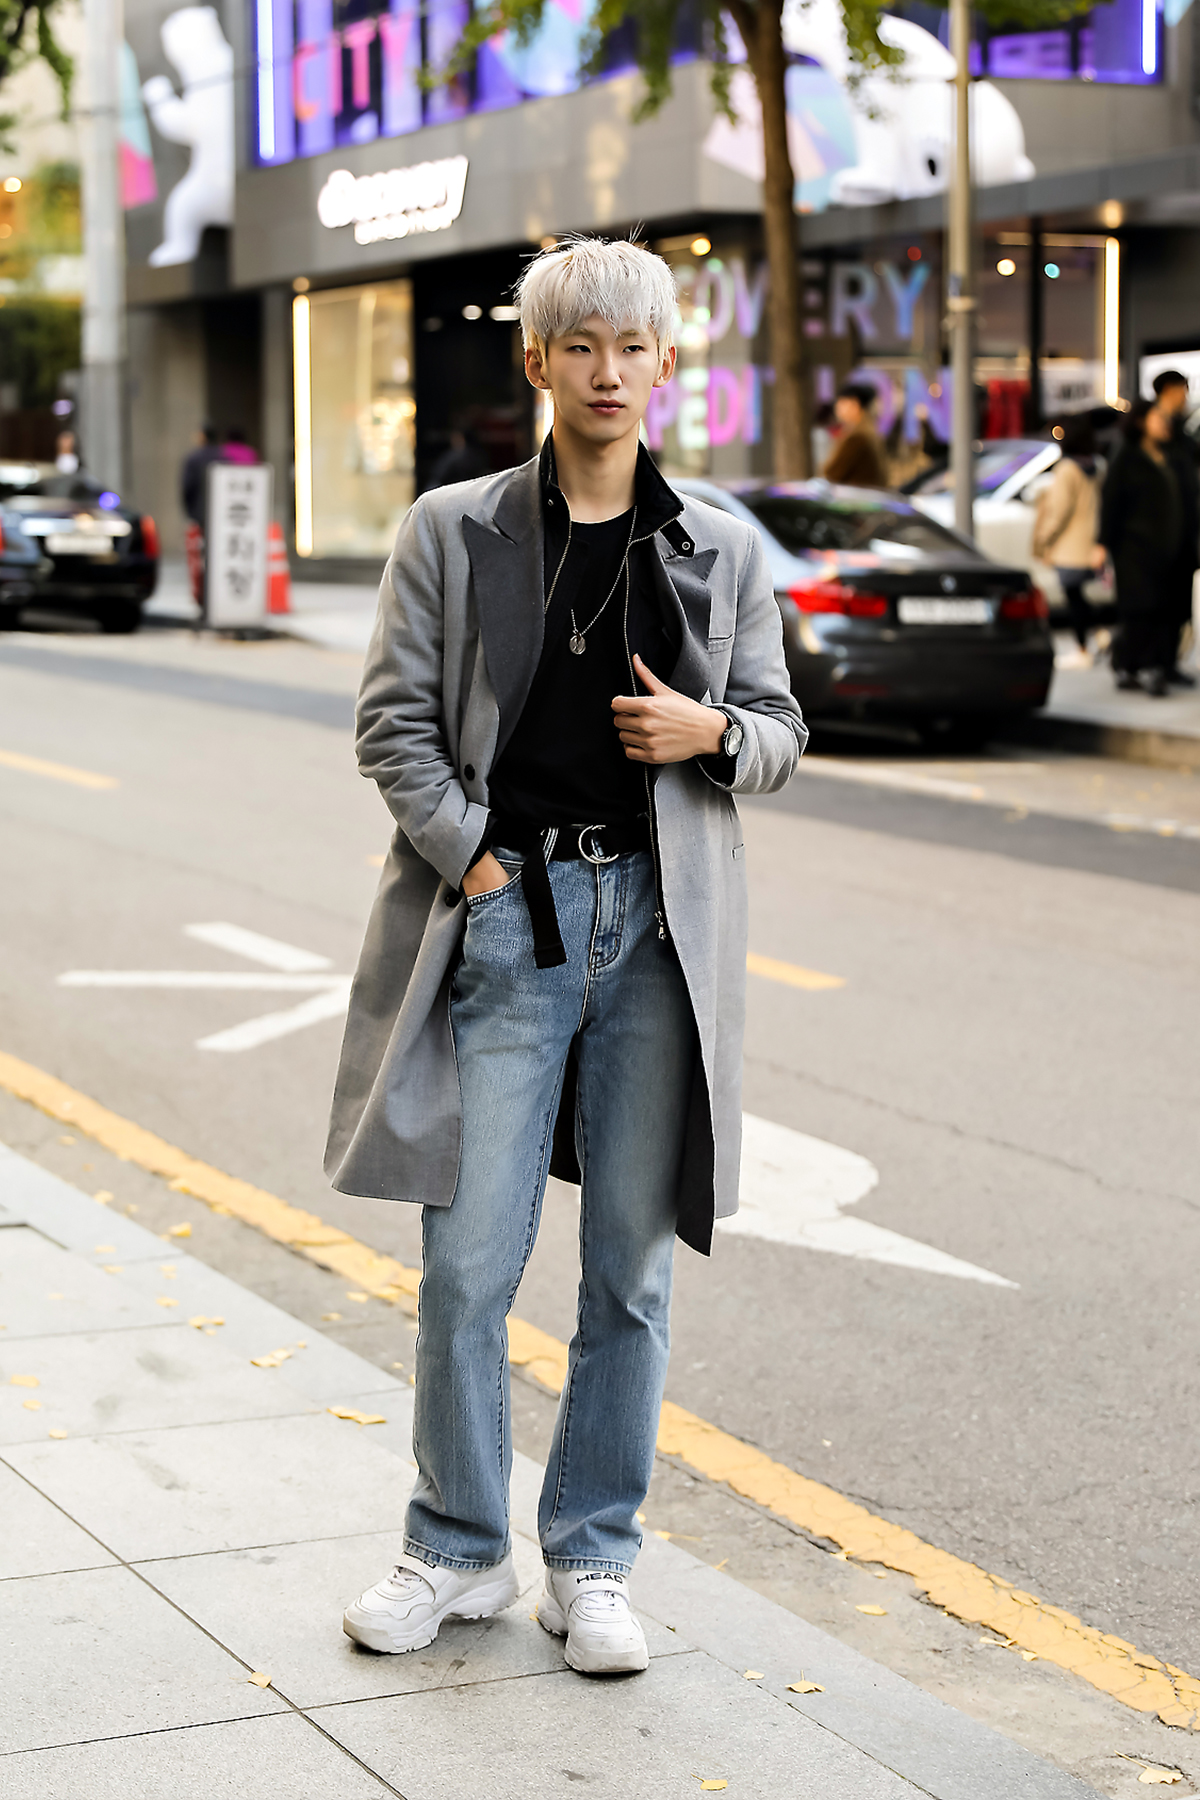 Men fall street style last week of october 2018 inseoul7